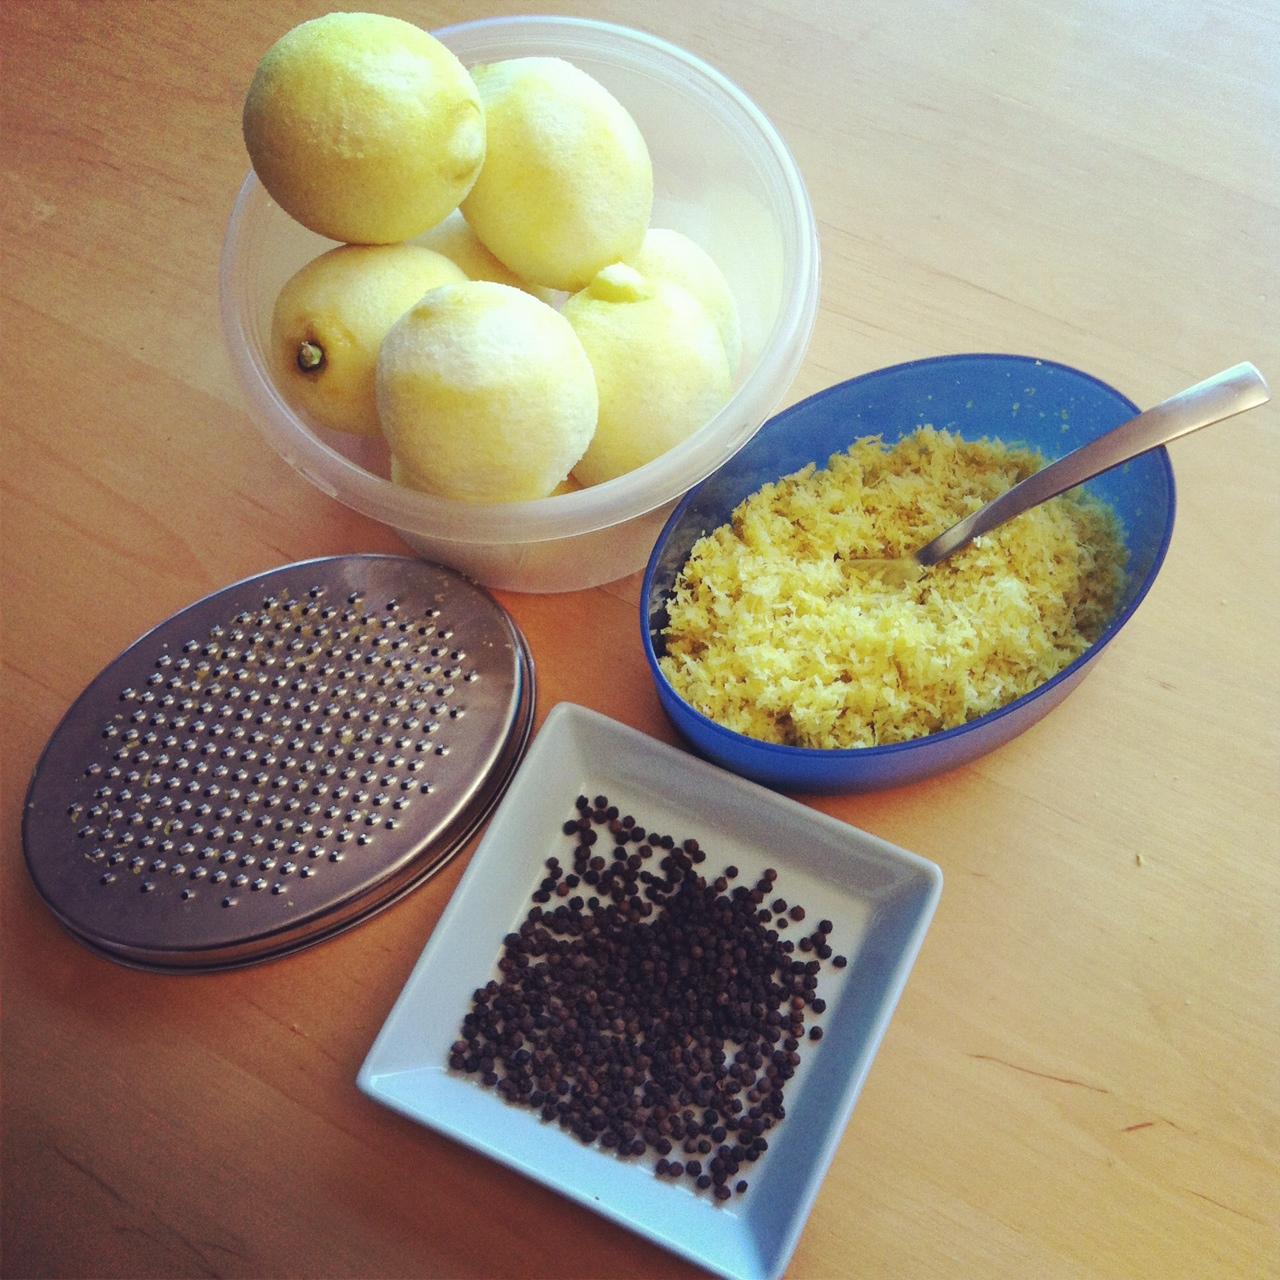 Homemade Lemon Pepper Recipe from SewCreativeBlog